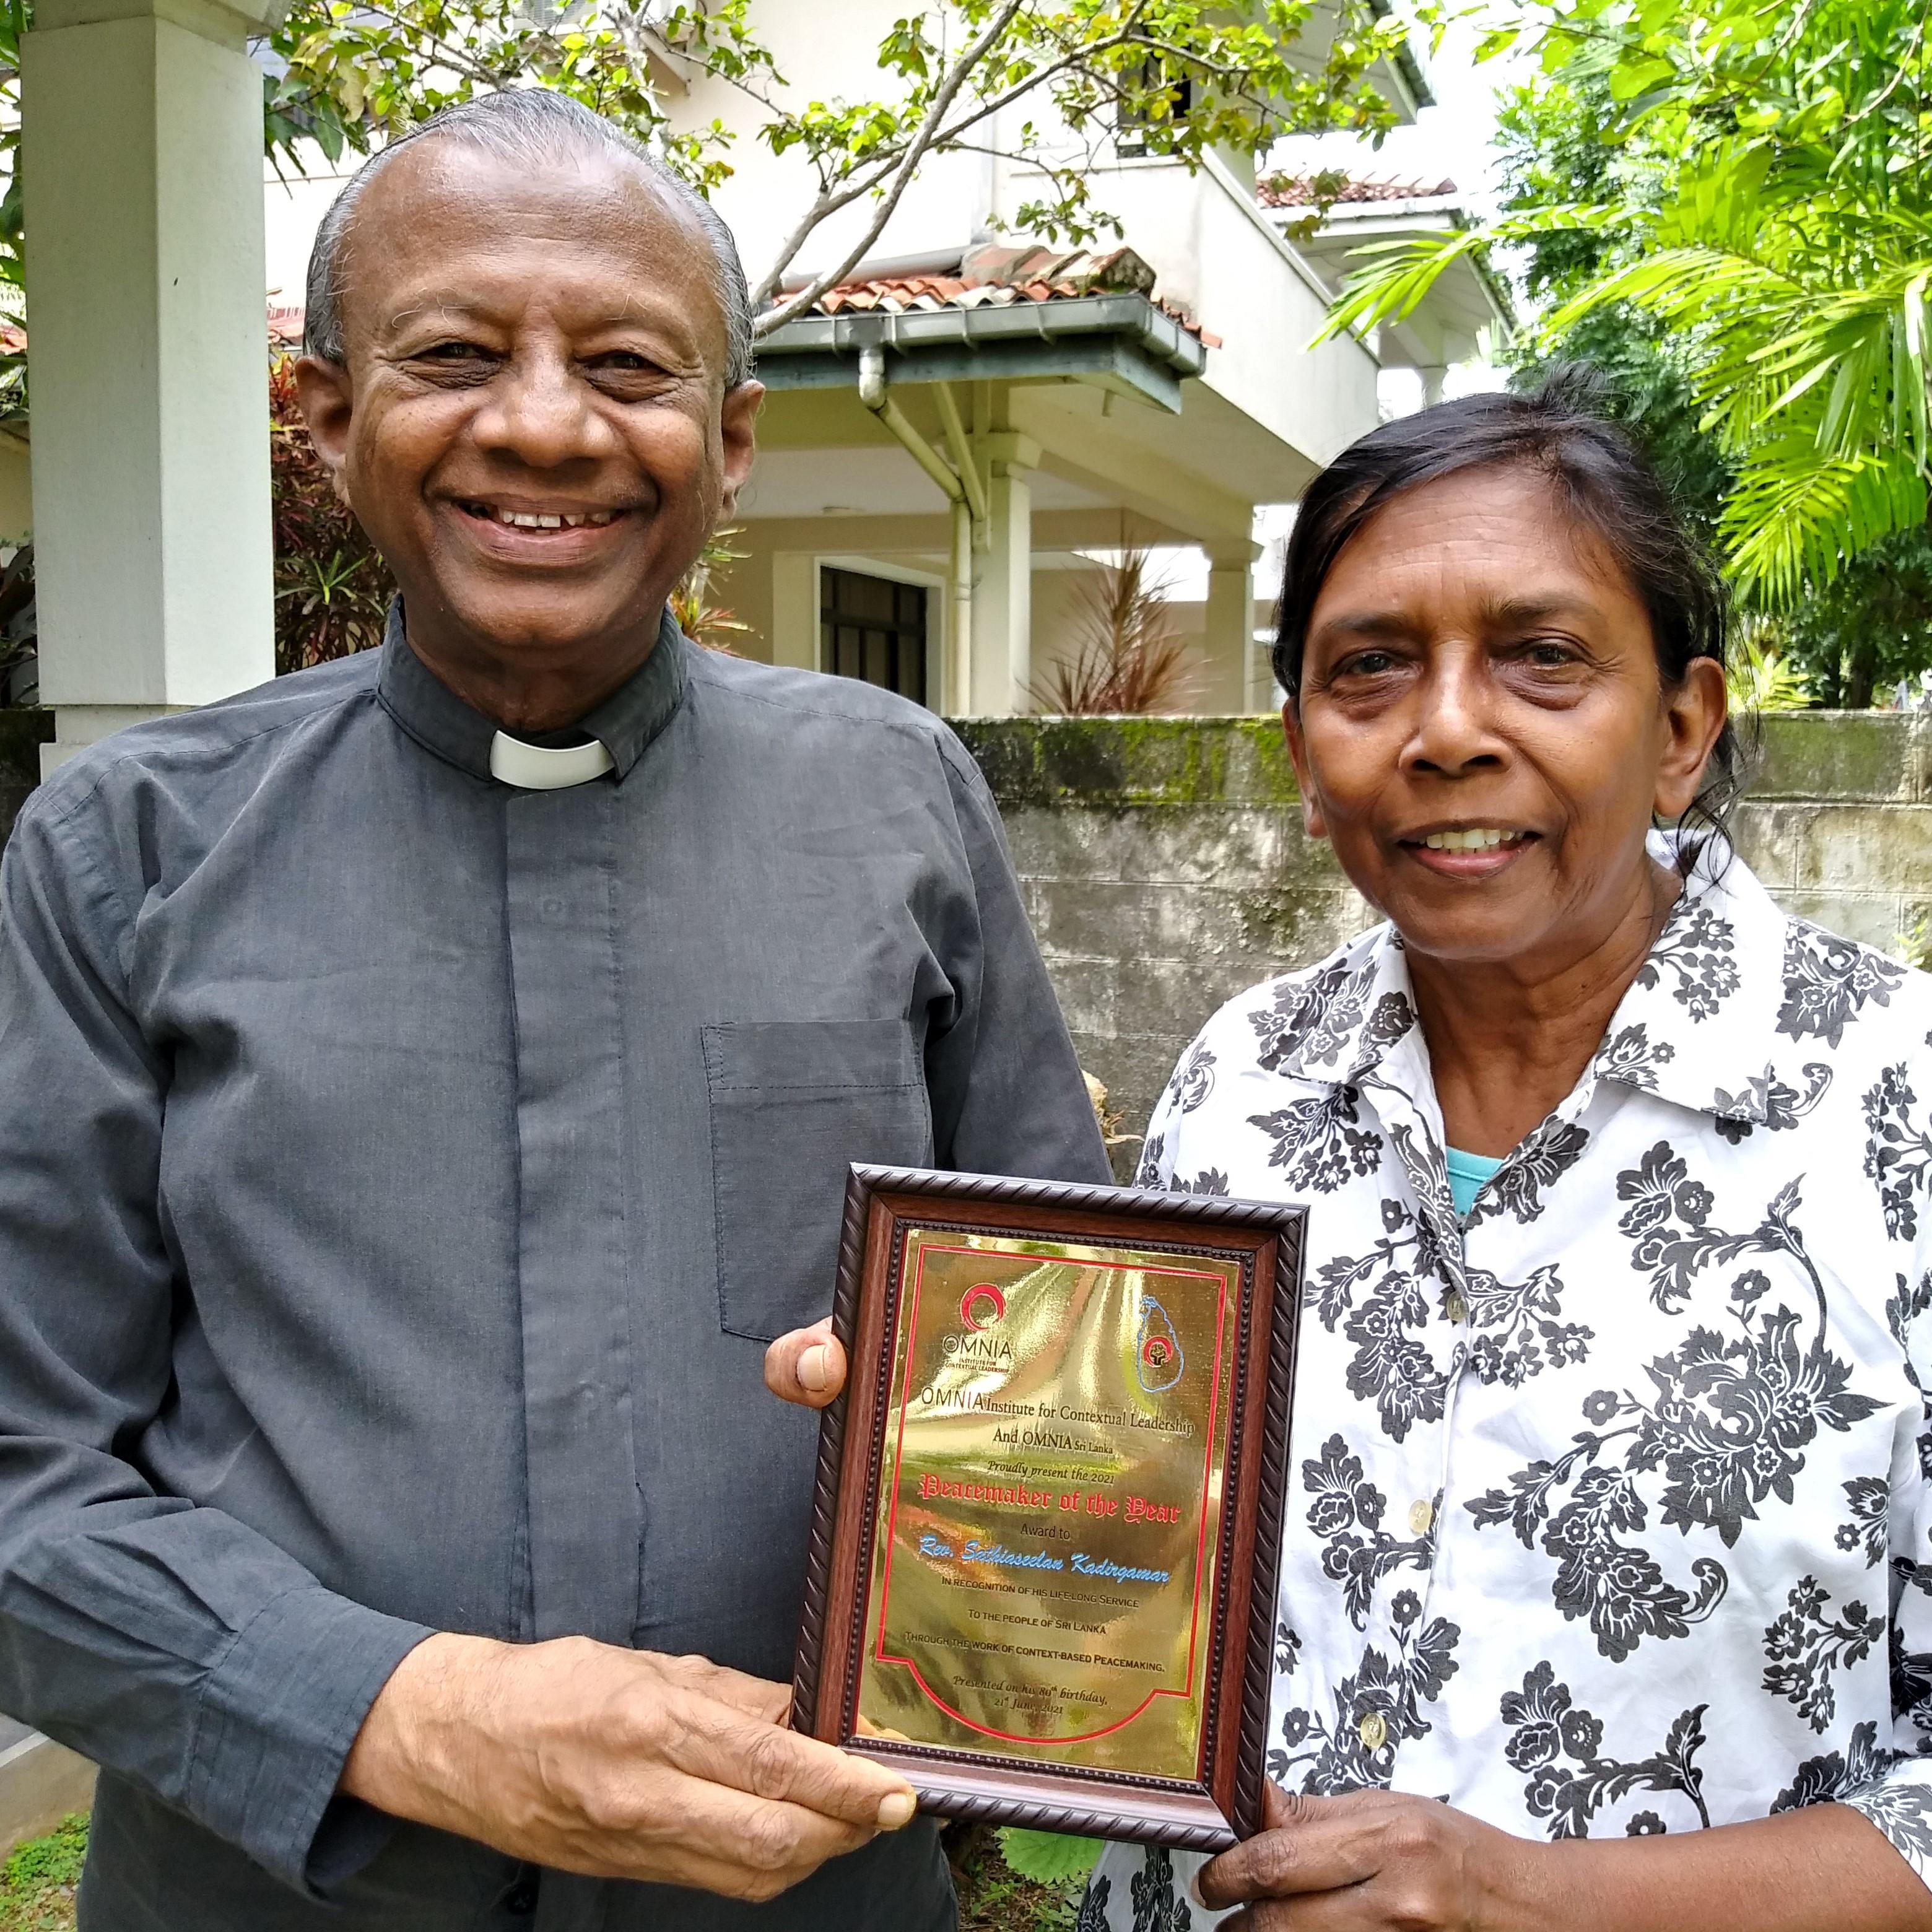 Rev. Sathian Kadirgamar Receives 2021 Peacemaker of the Year Award (Sri Lanka)